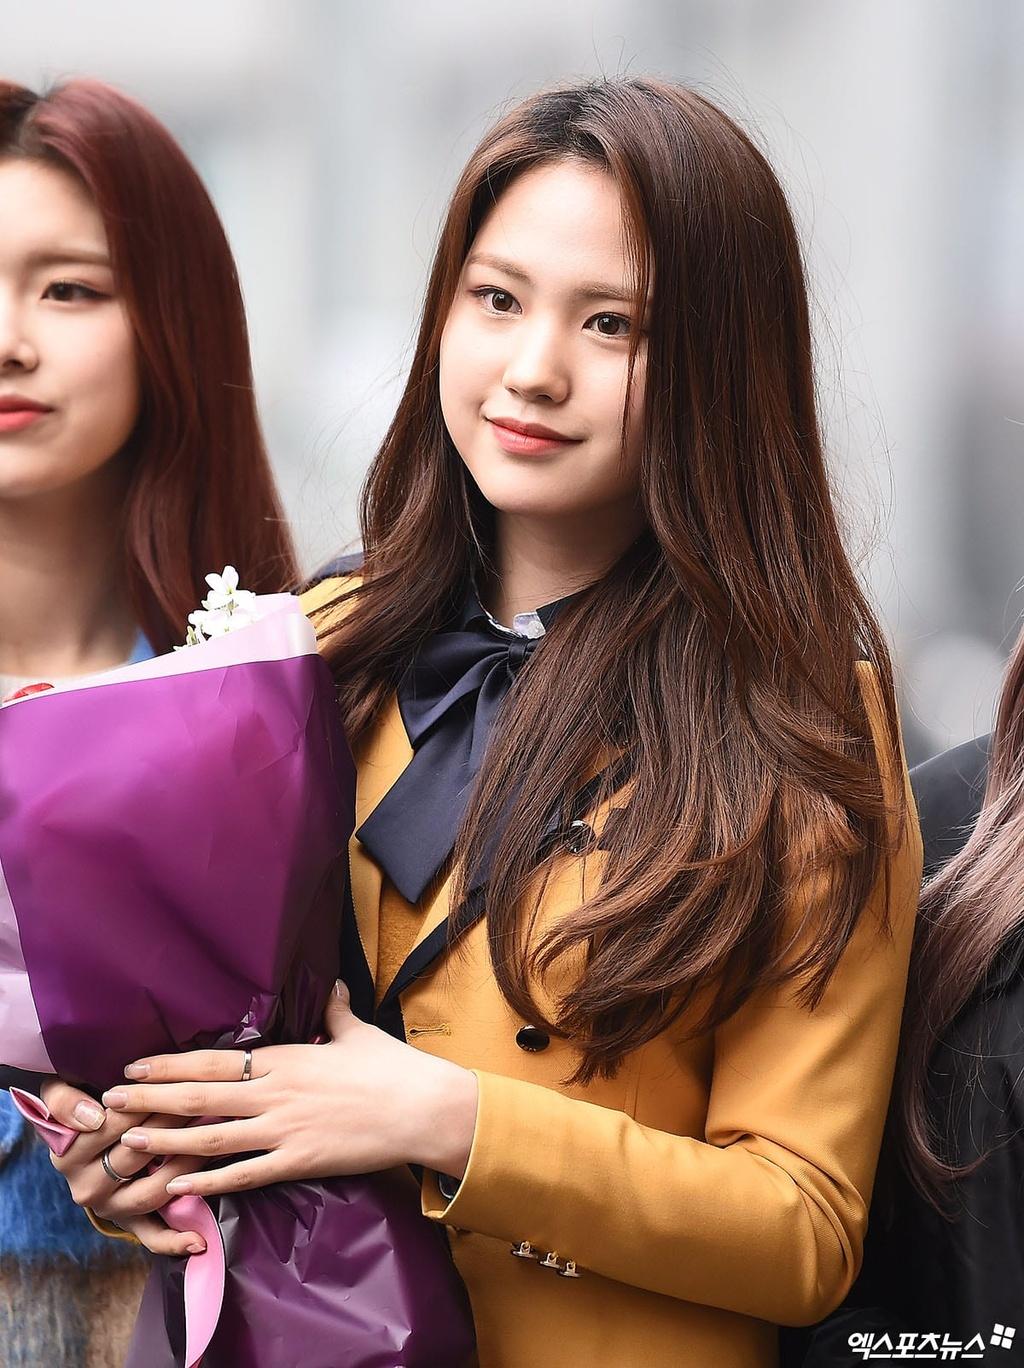 My nhan IZ*ONE lan at dan idol trong le tot nghiep hinh anh 7 DreamNote_Sumin_XPN.jpg